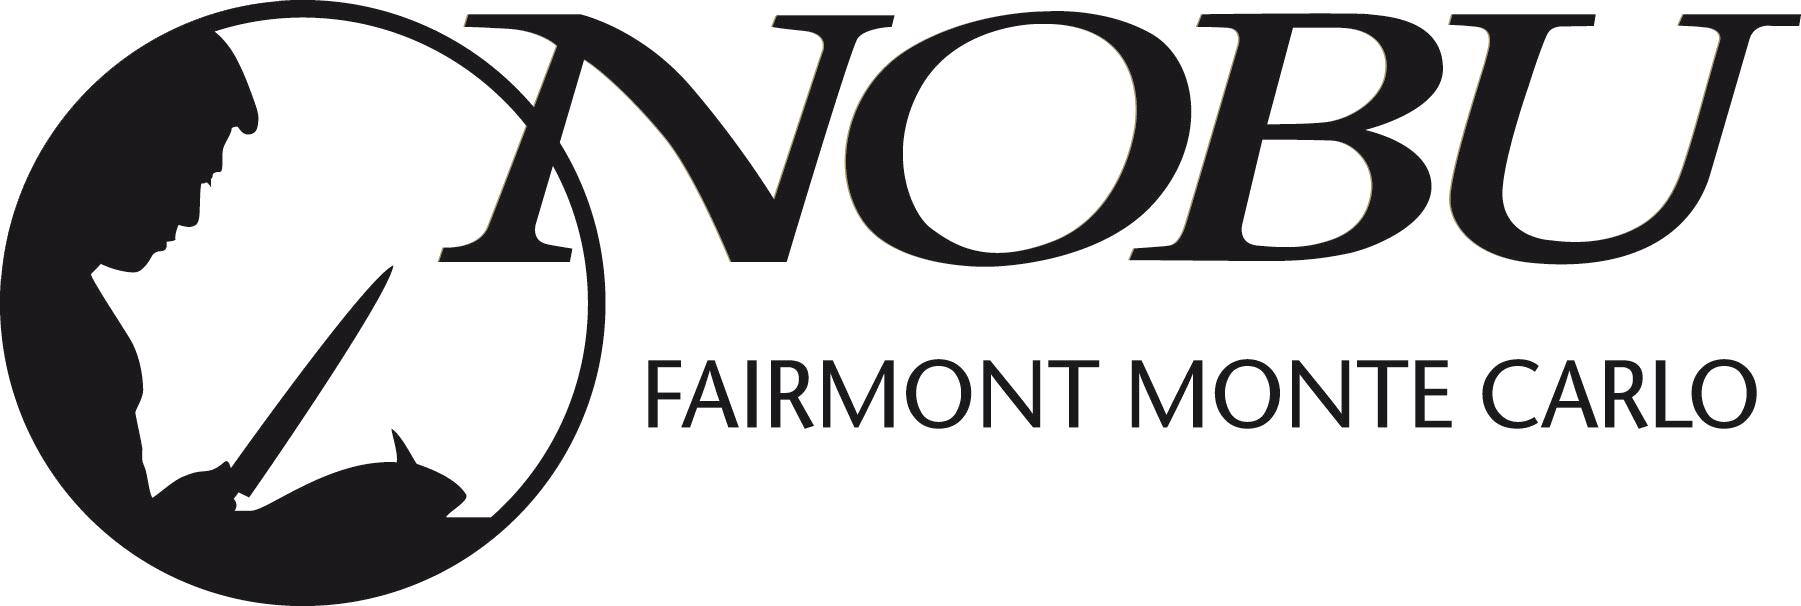 Ristorante Nobu Faimont Monte CarloLogo of